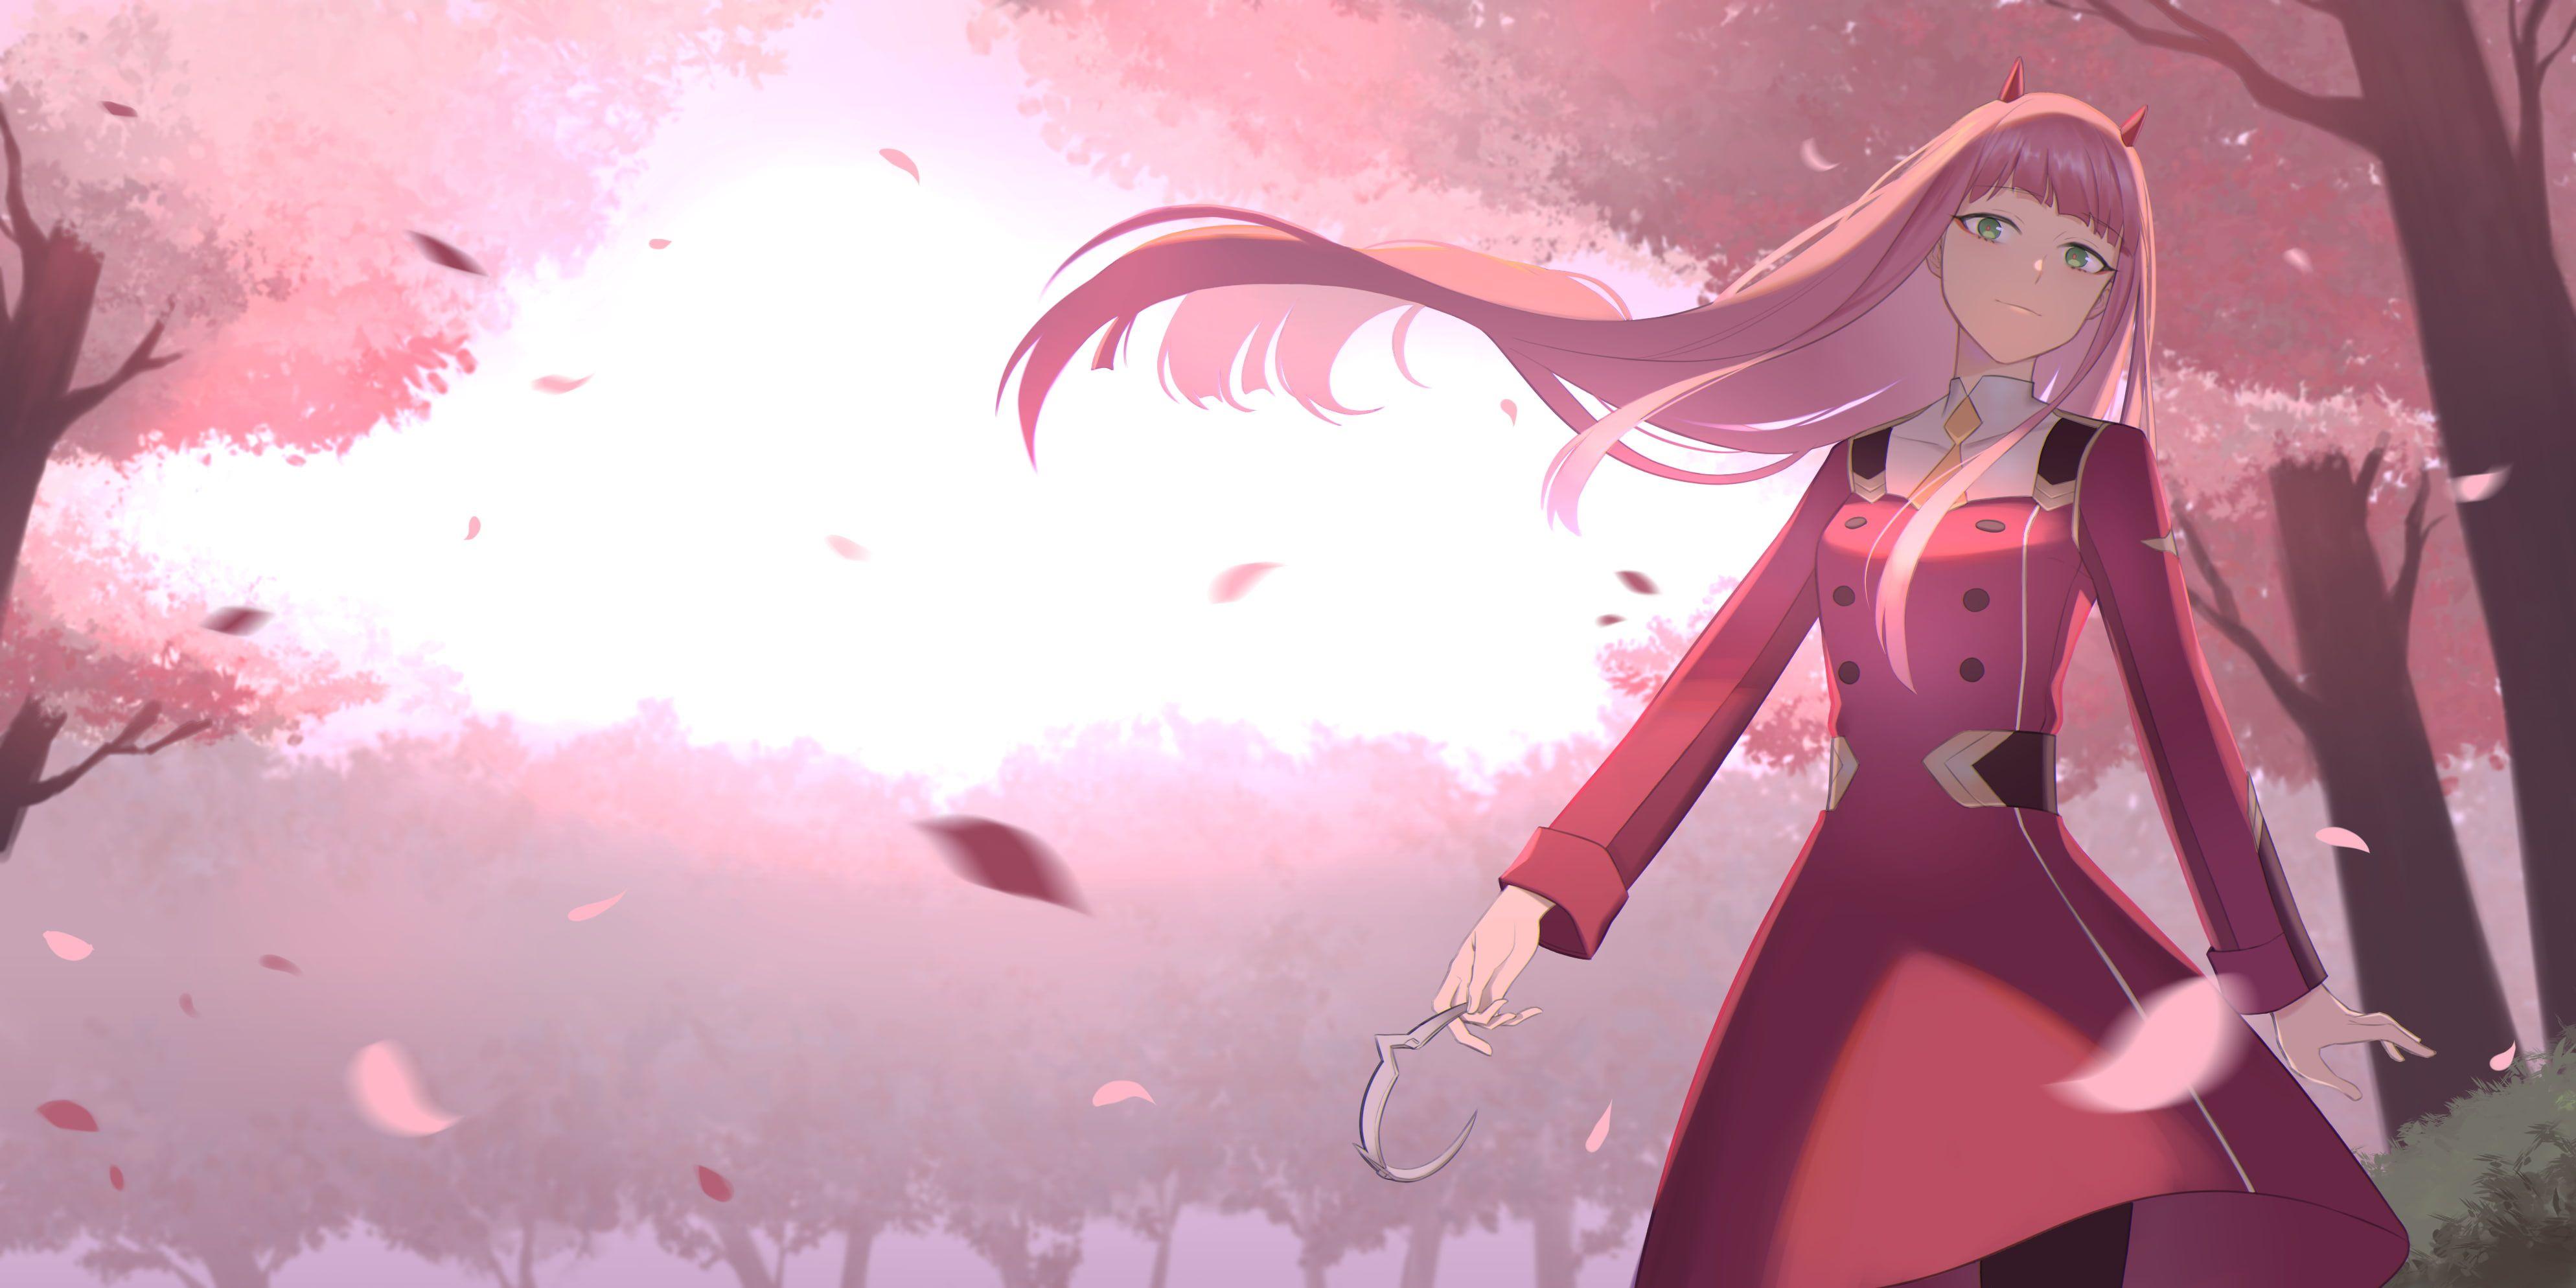 Darling Franxx The Two Zero 4k Wallpaper Hdwallpaper Desktop Anime Background Anime Backgrounds Wallpapers Anime Wallpaper